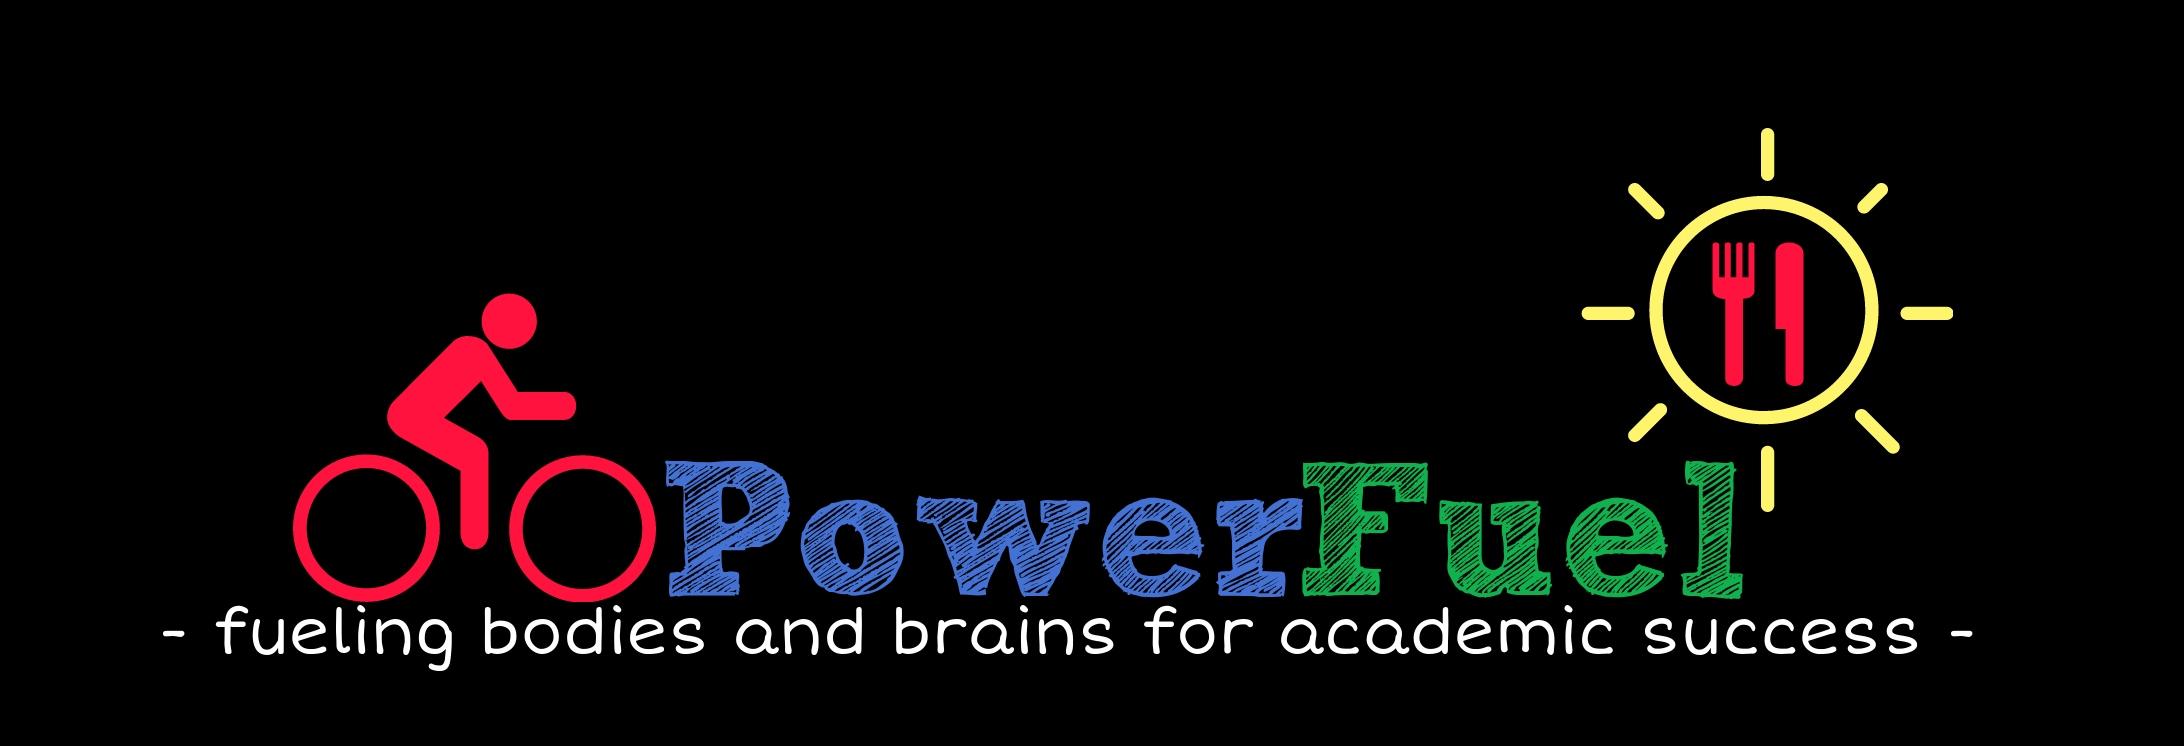 power-fuel-logo_21994780_(2).jpg